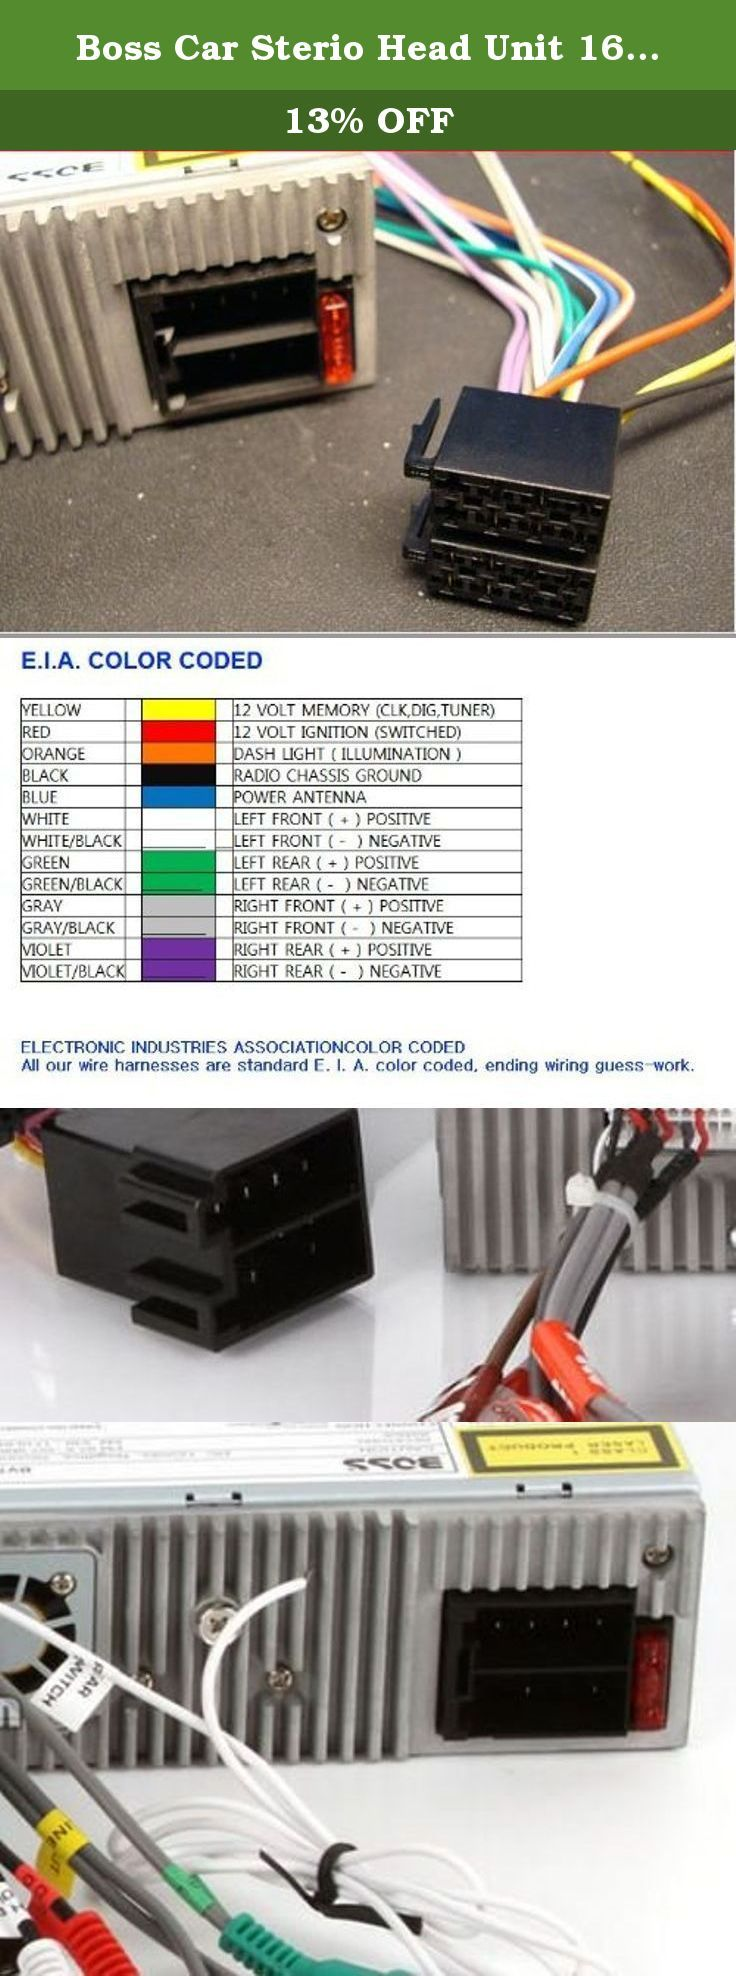 boss car sterio head unit 16 pin wire harness power plug cd mp3 dvd  [ 736 x 1976 Pixel ]